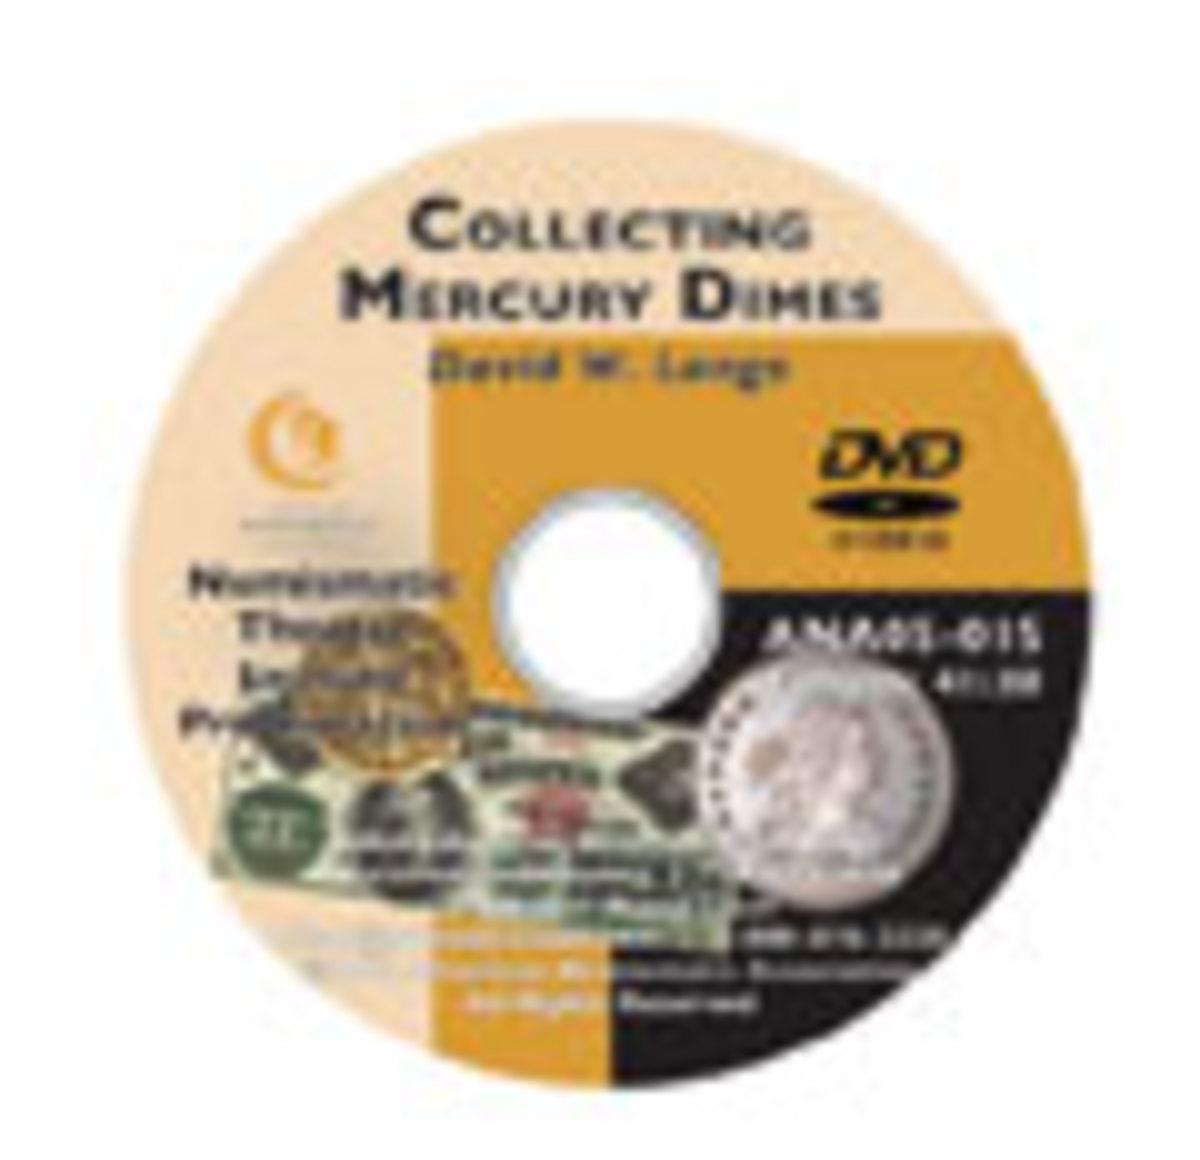 Collecting Mercury Dimes